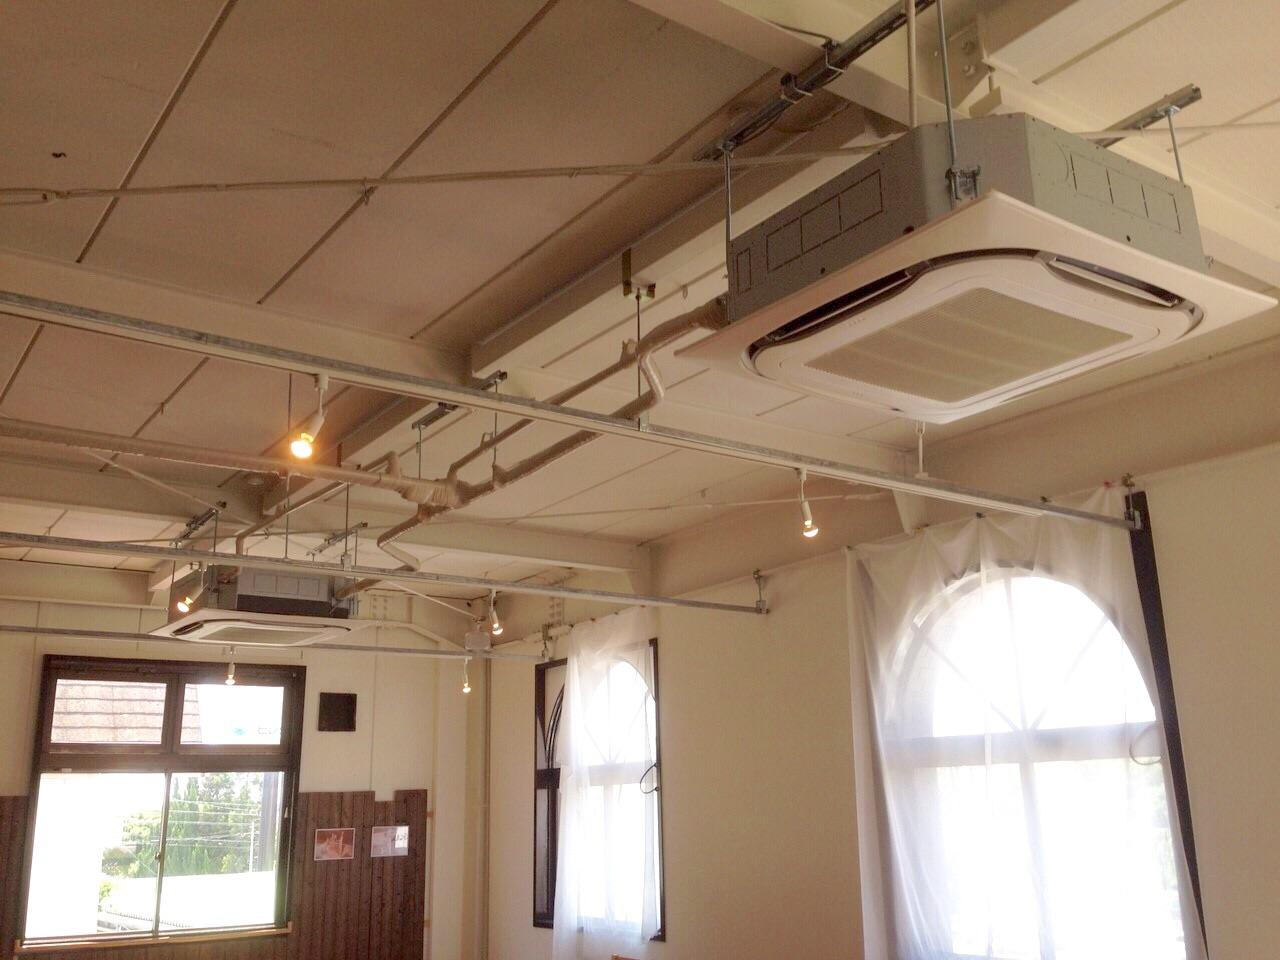 愛知県東郷町 | 業務用エアコン工事 | 27年8月20日